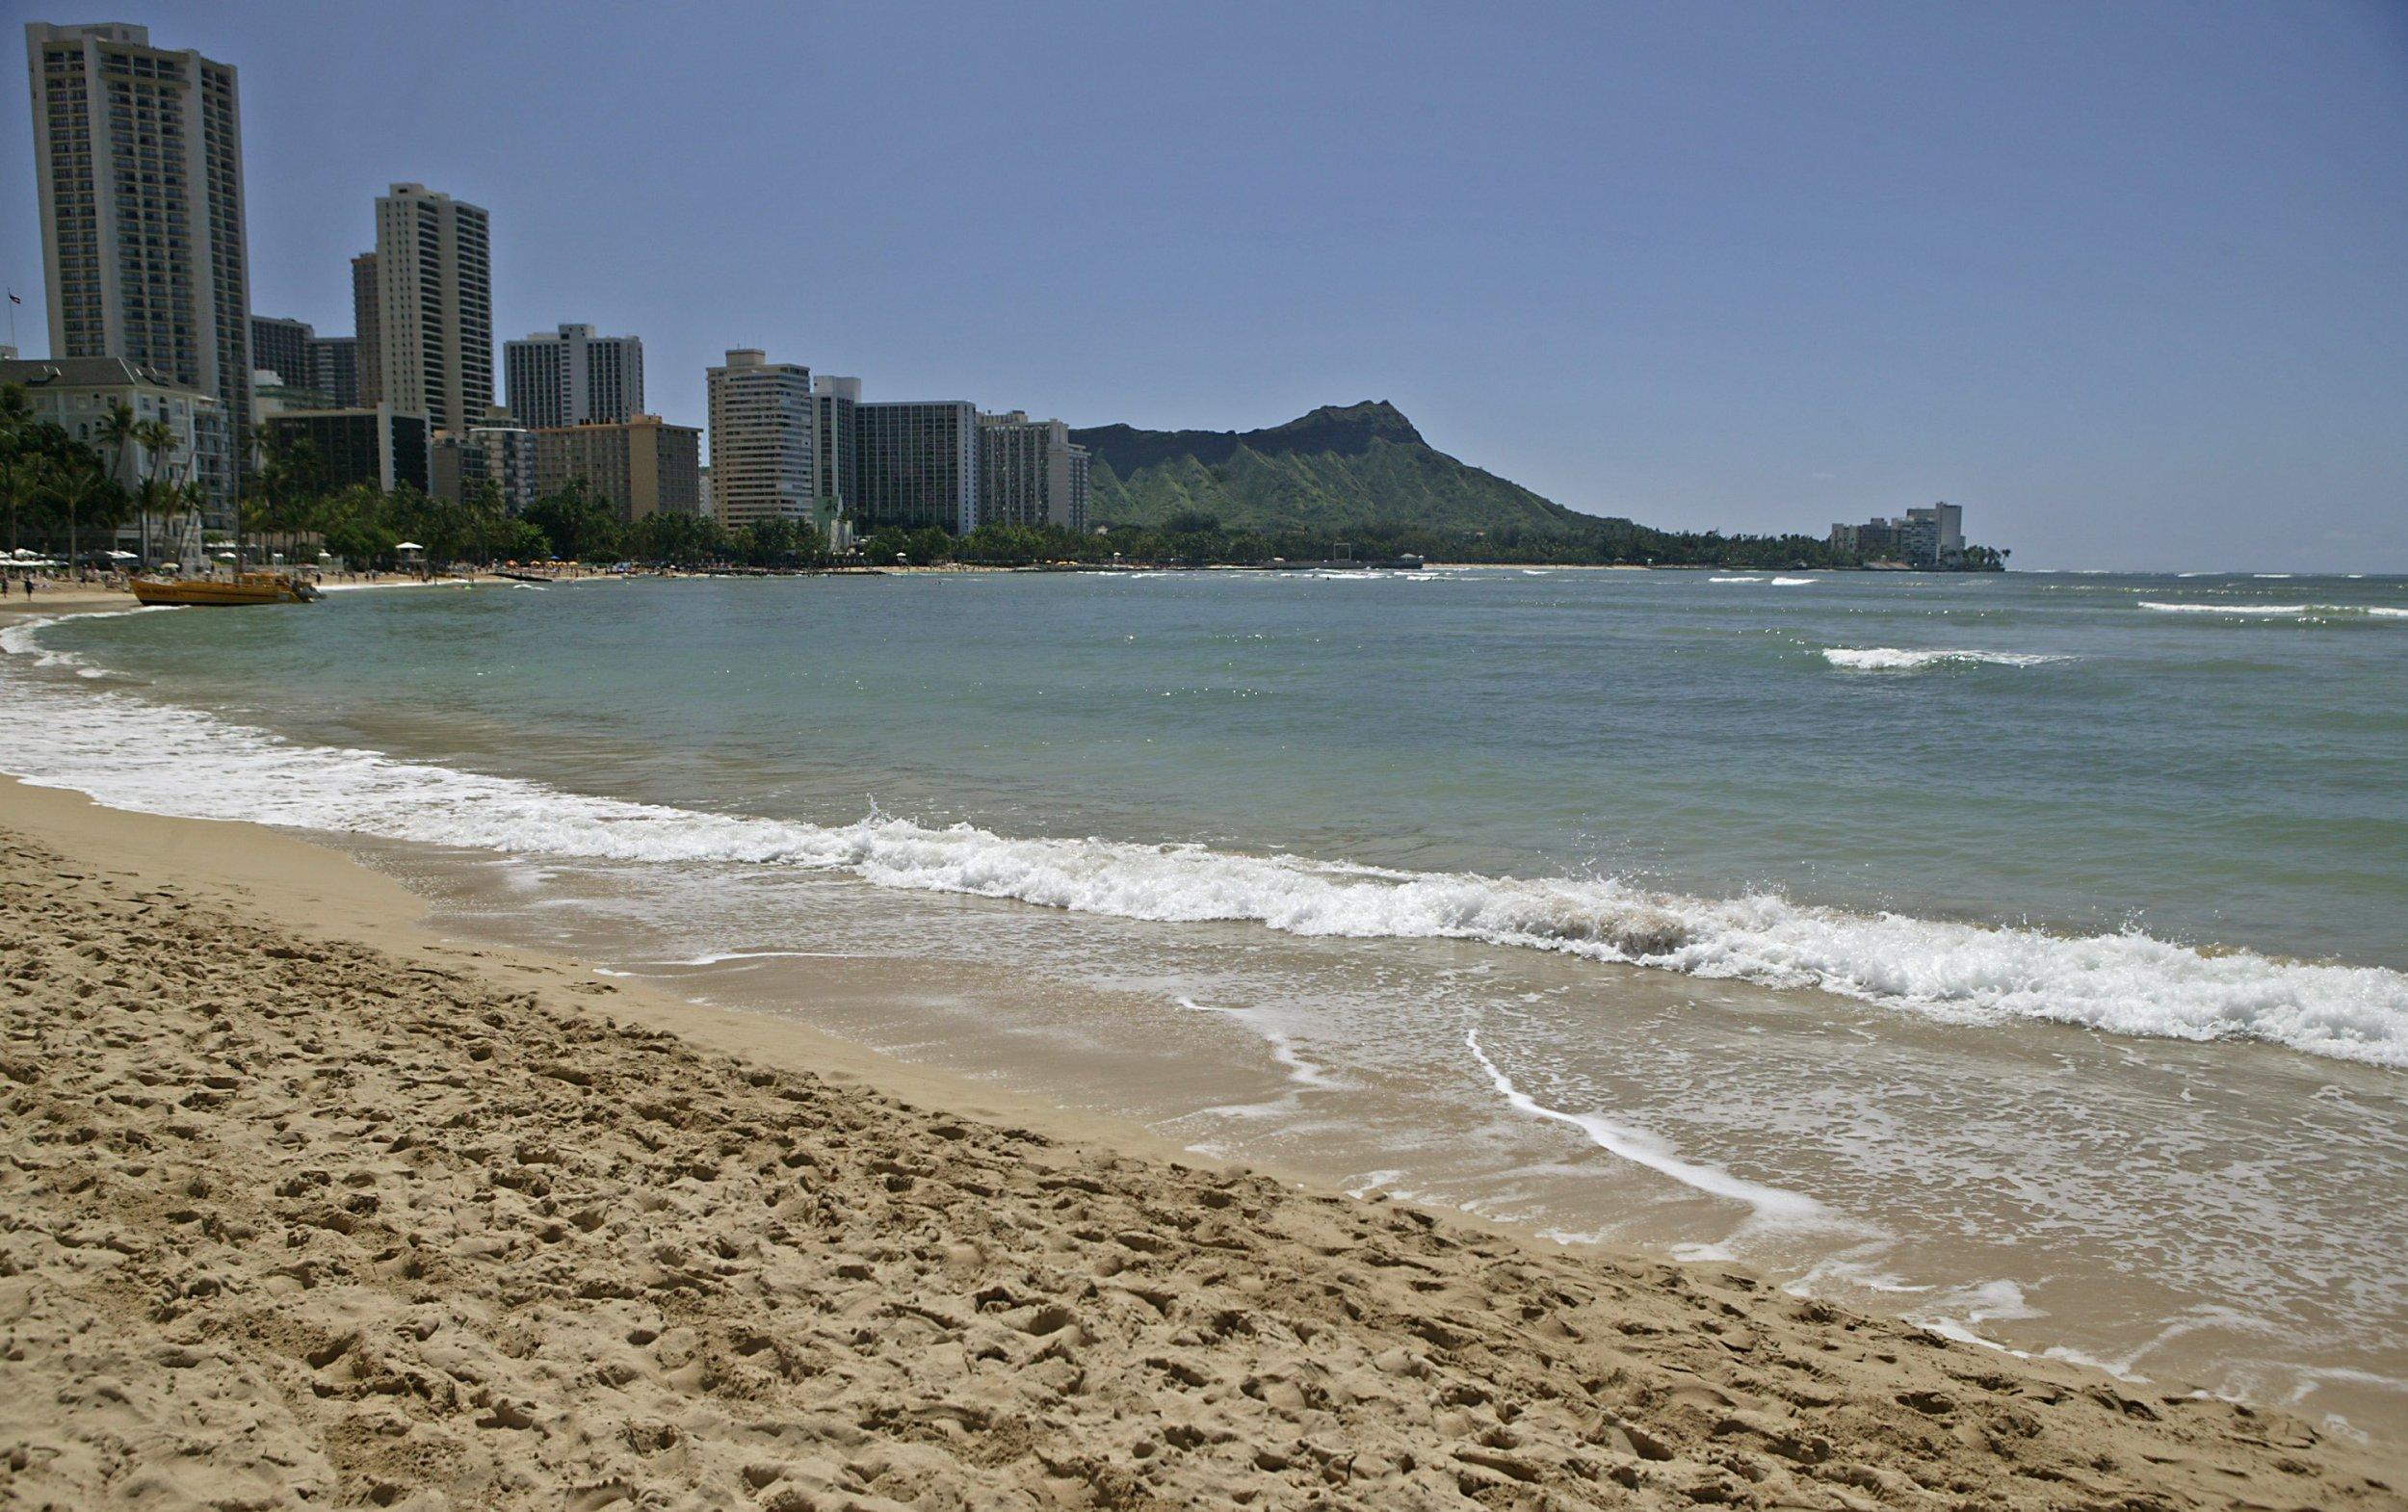 Hawaii Nudist Resort at Center of Sex Crimes Investigation